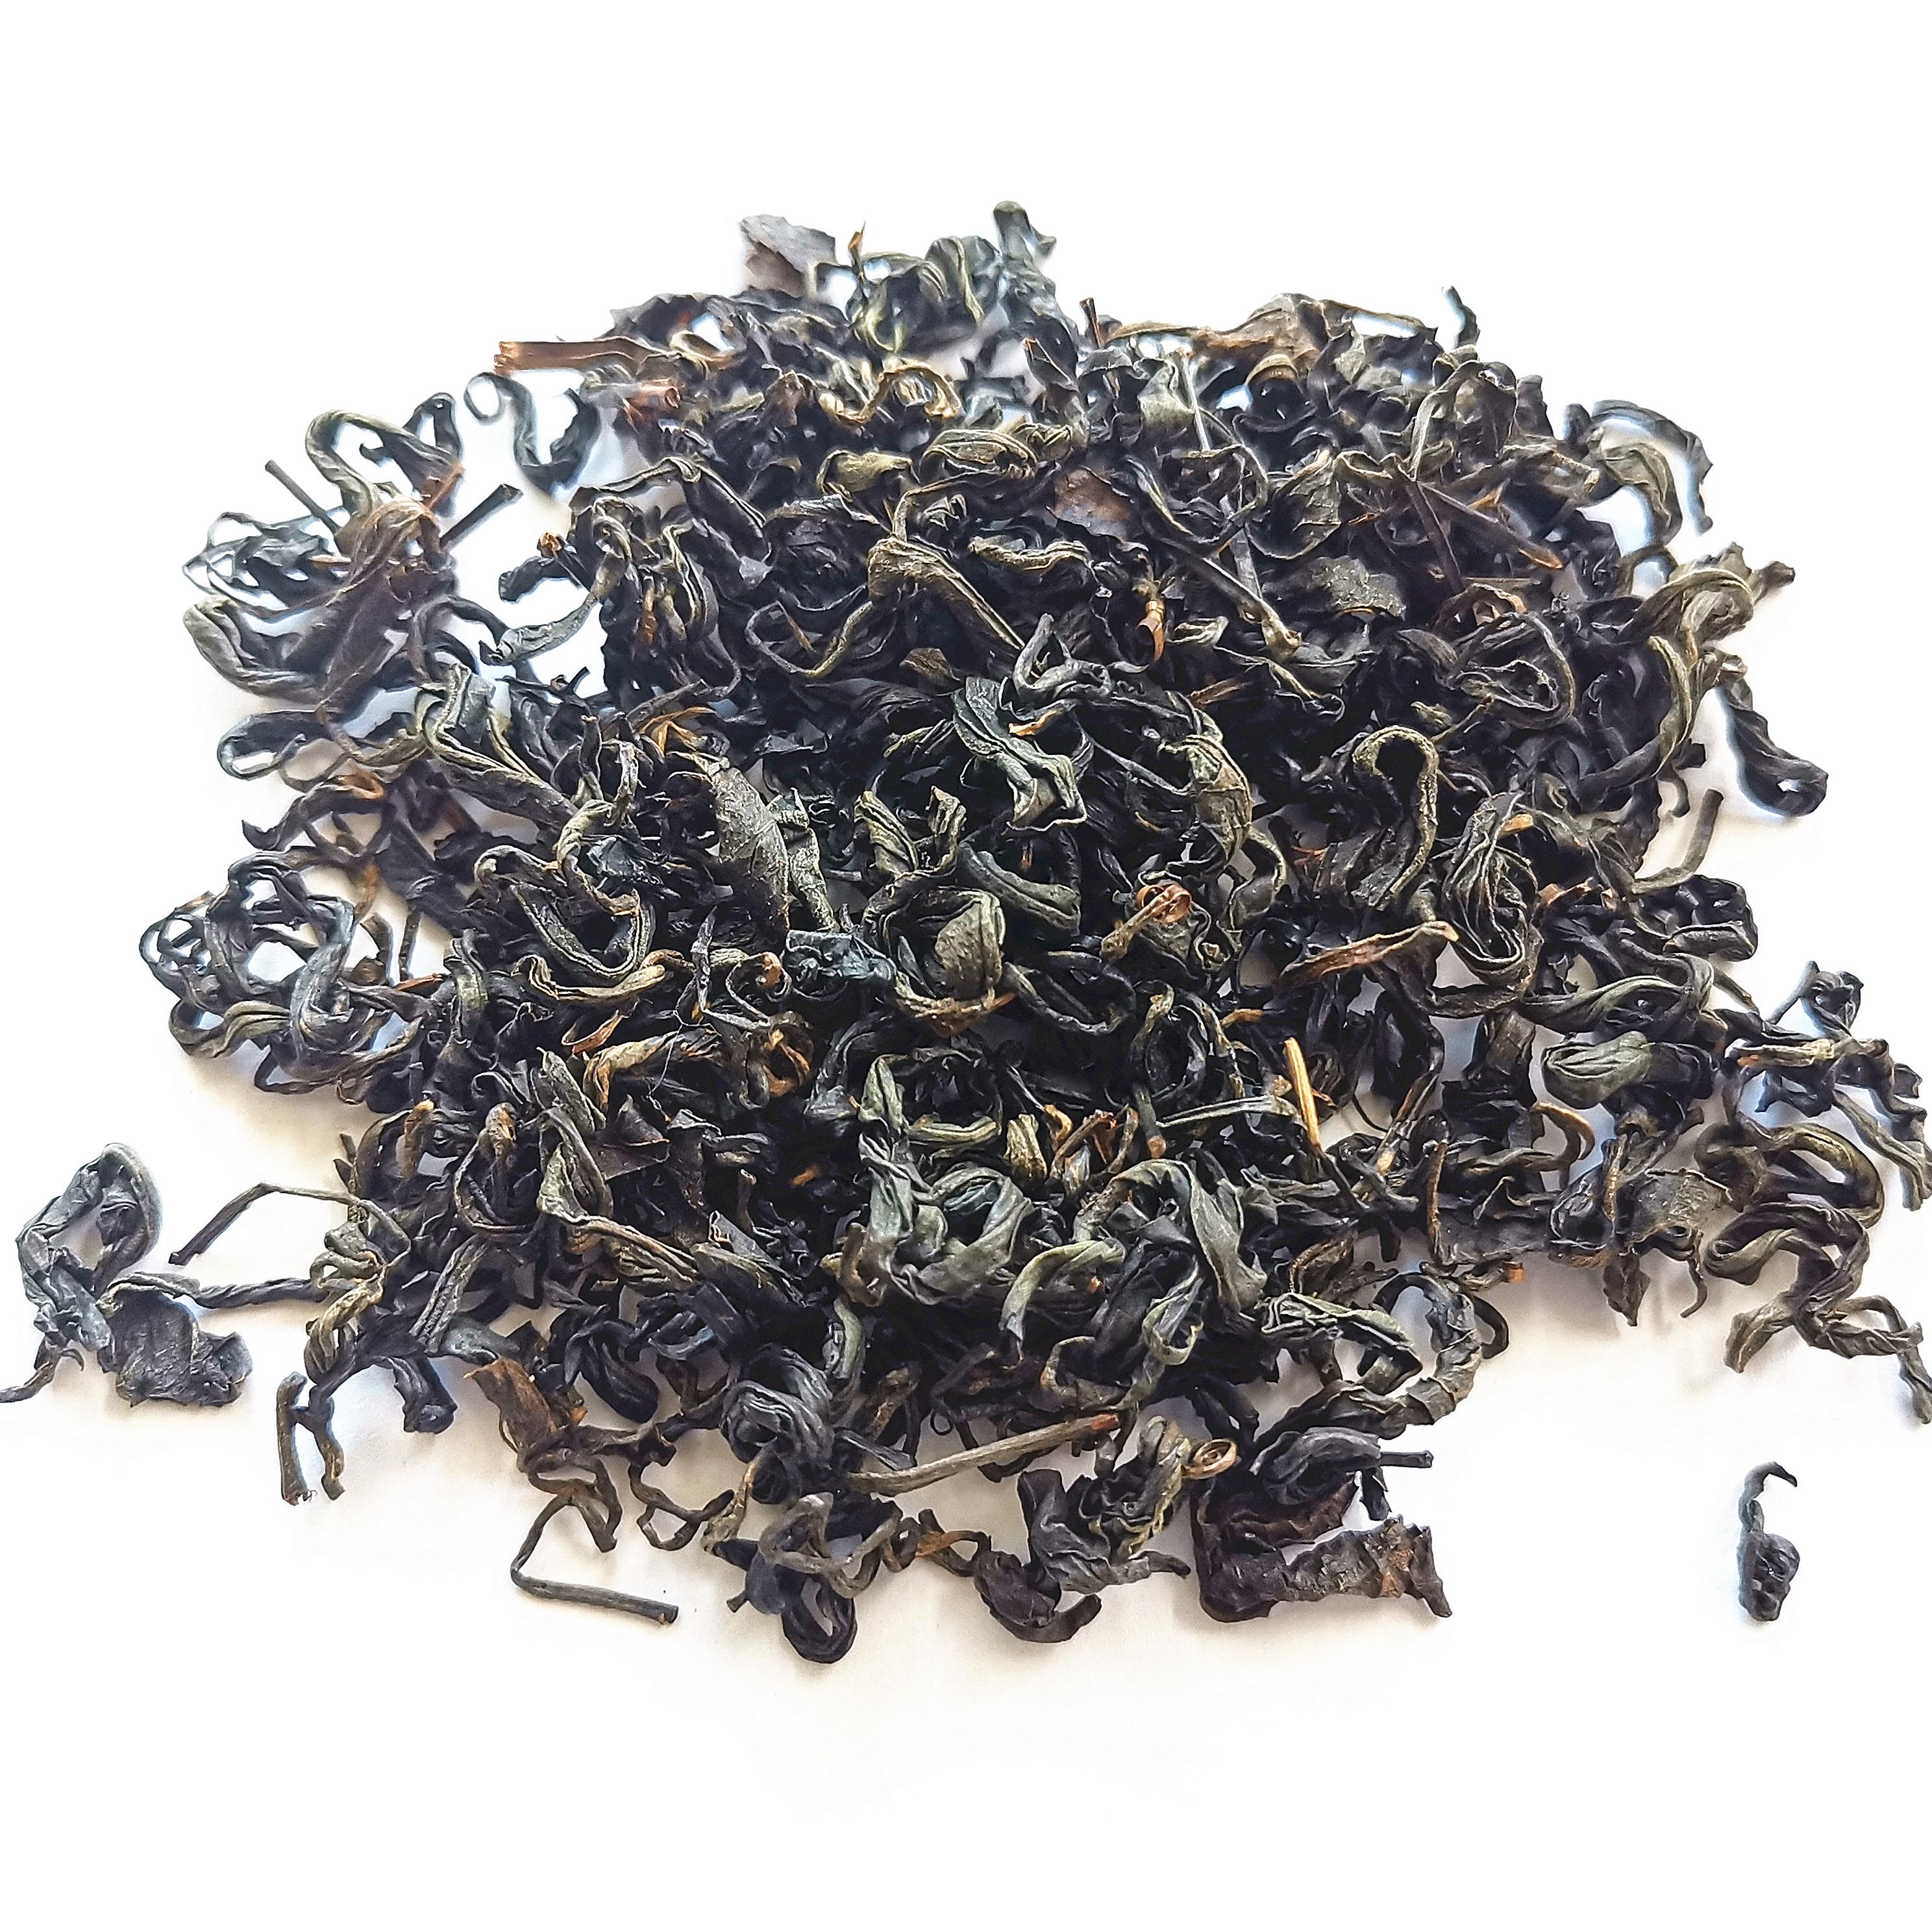 A-Dragon black tea Chinese traditional handmade organic black tea - 4uTea   4uTea.com